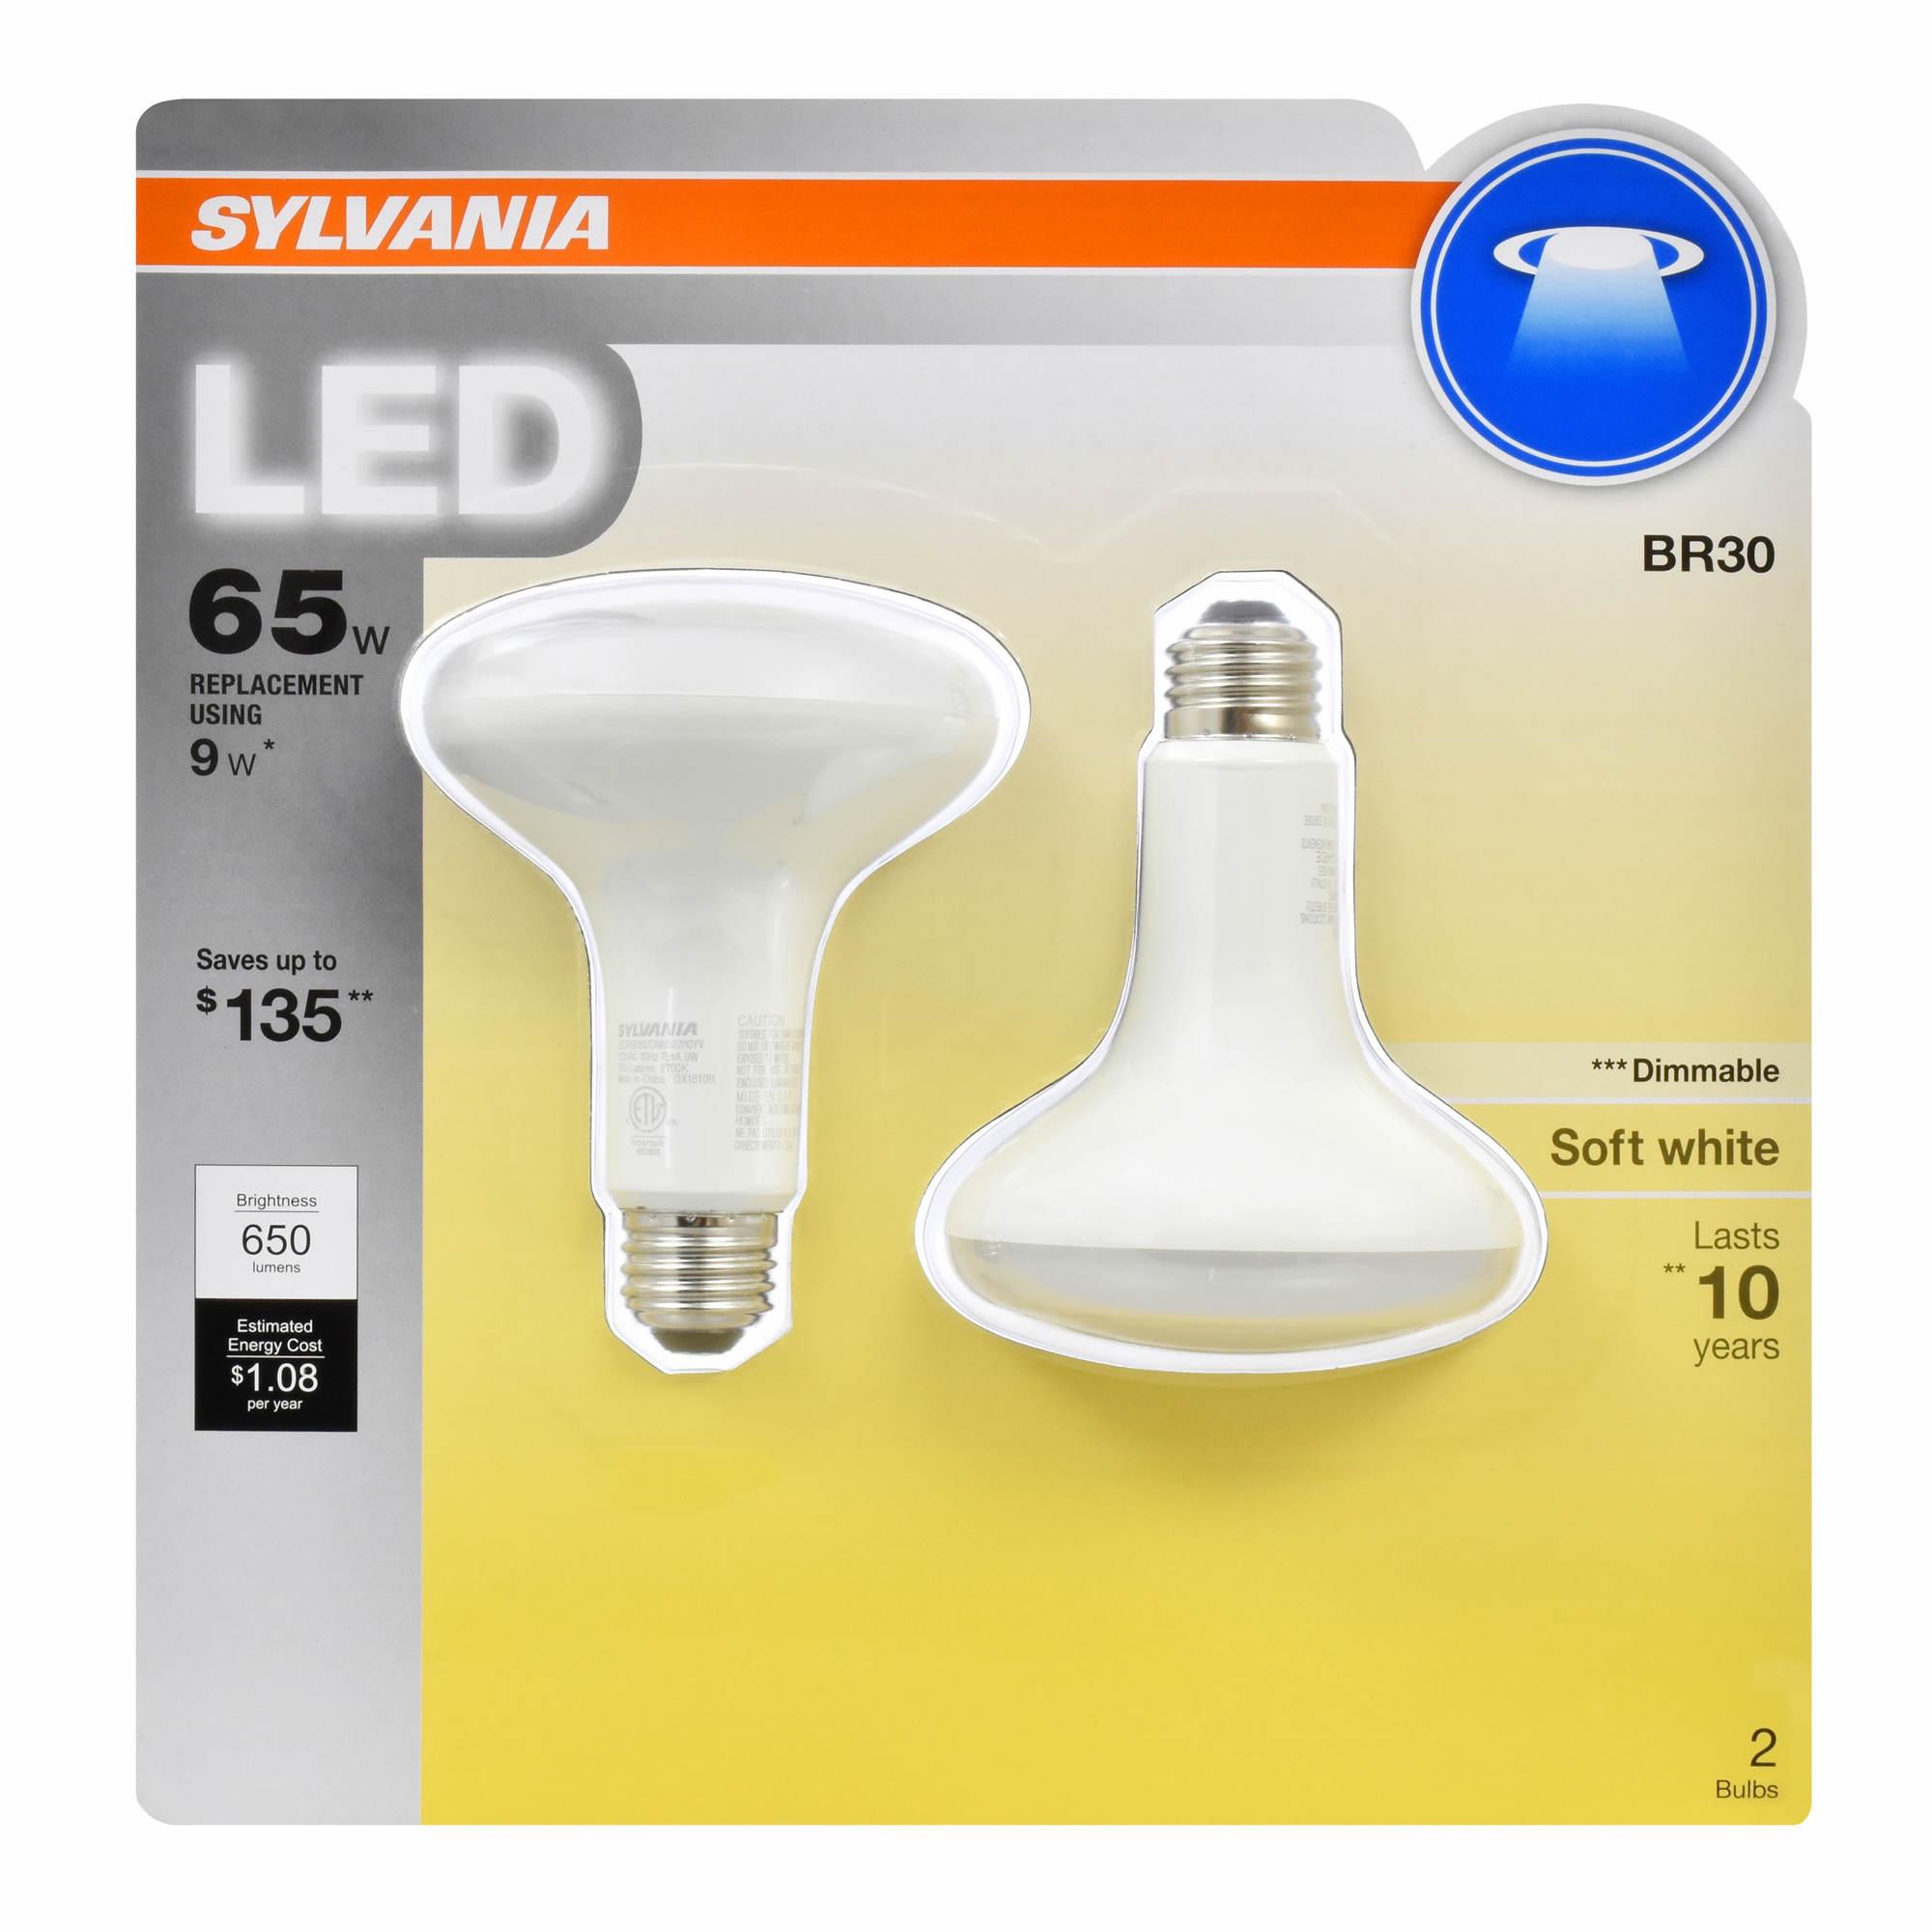 Sylvania Light Bulbs Customer Service: Sylvania 65W Equivalent LED BR30 Lamp Light Bulb, 2 pk. - Soft White,Lighting